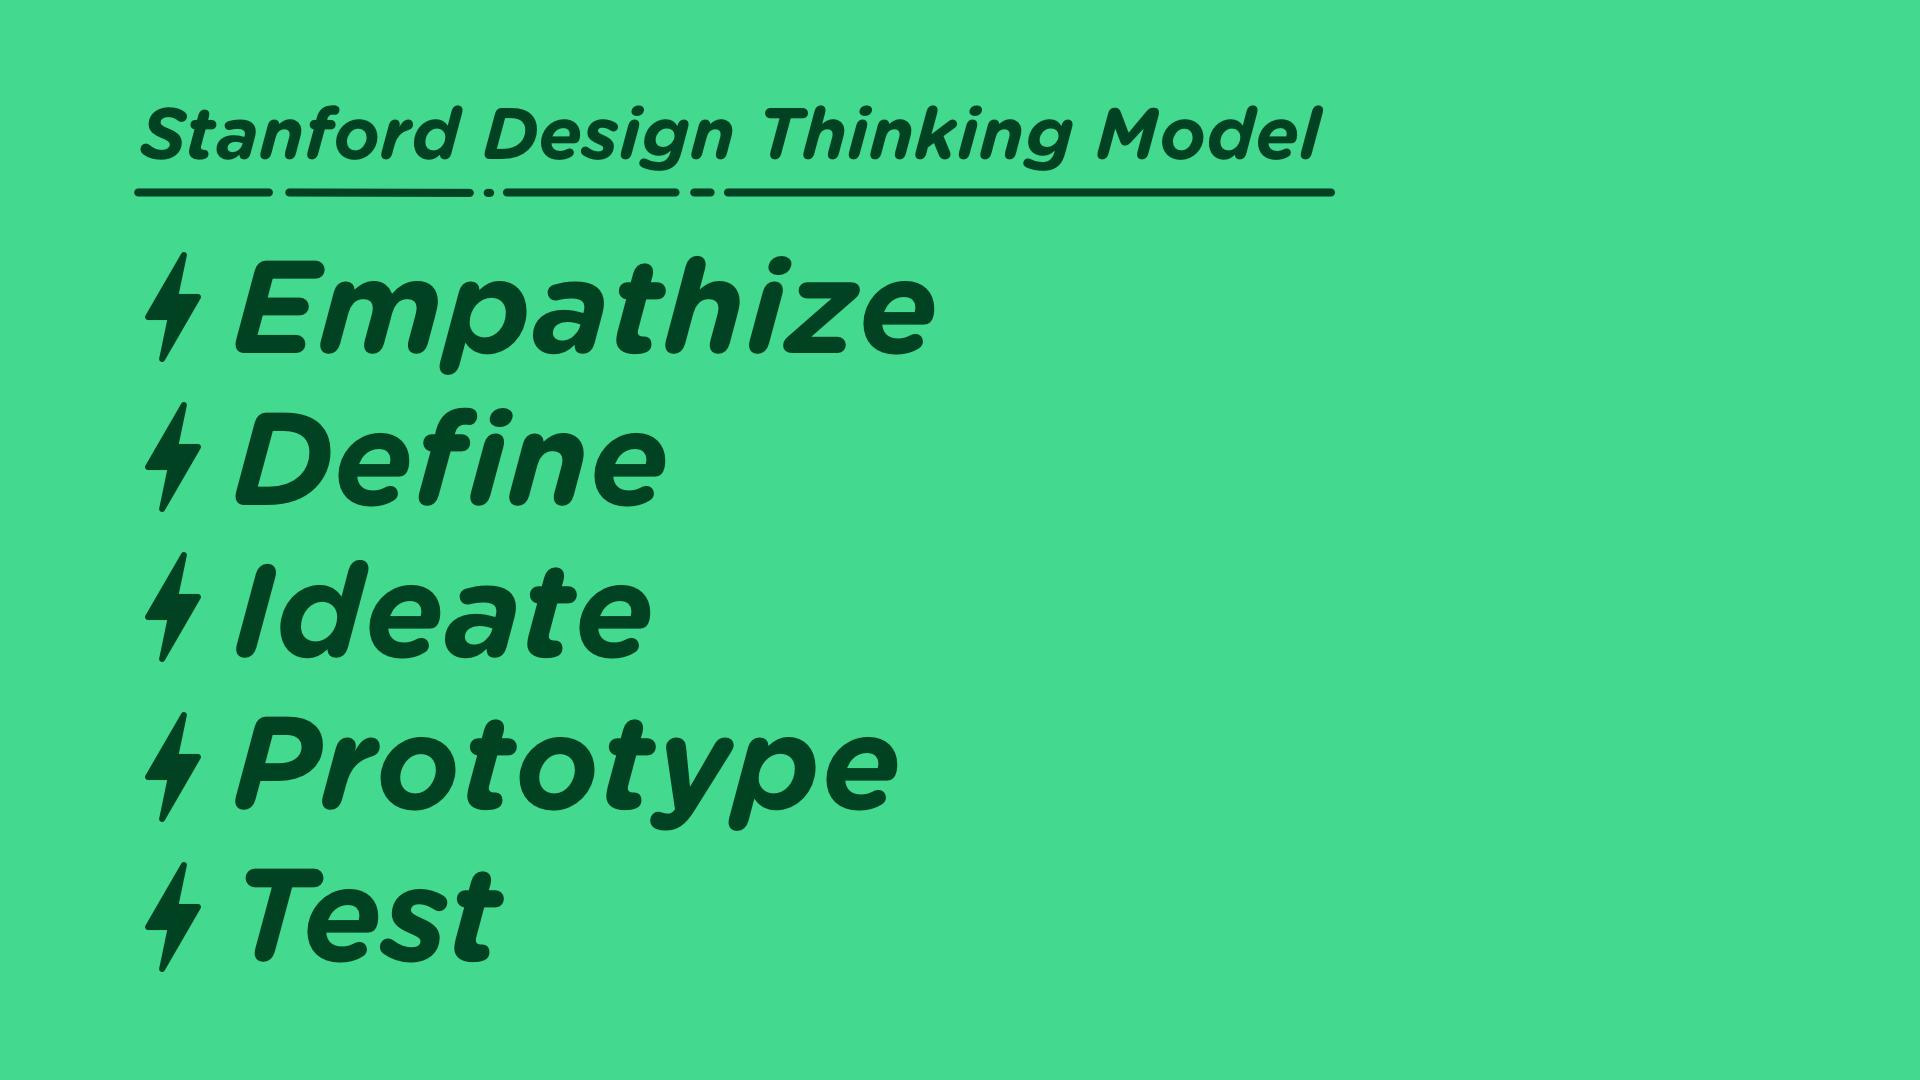 Stanford Design Thinking Model: Empathize, Define, Ideate, Prototype, Test